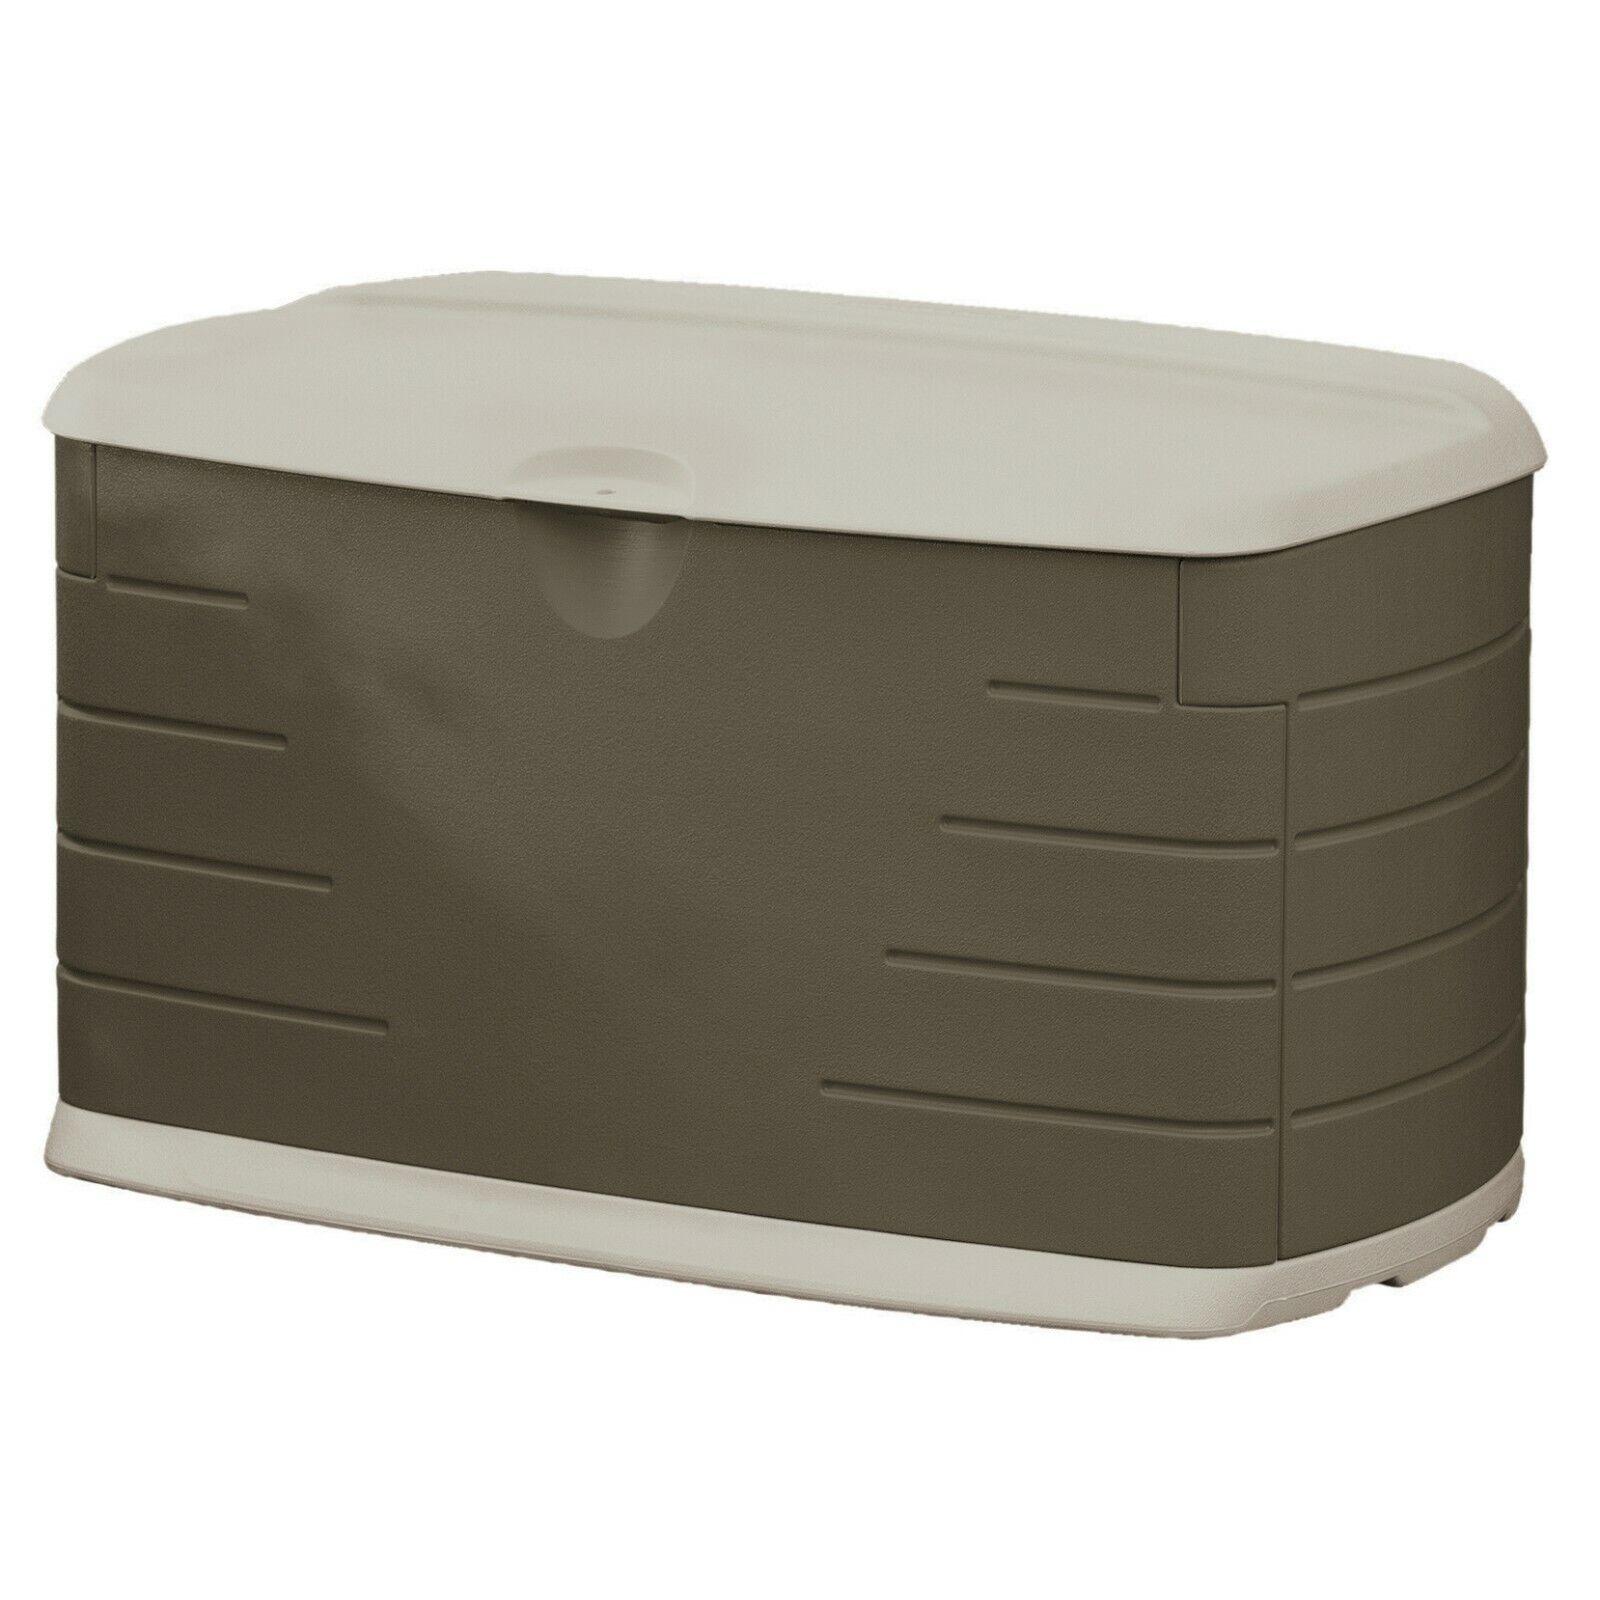 121 gallon deck box with seat storage